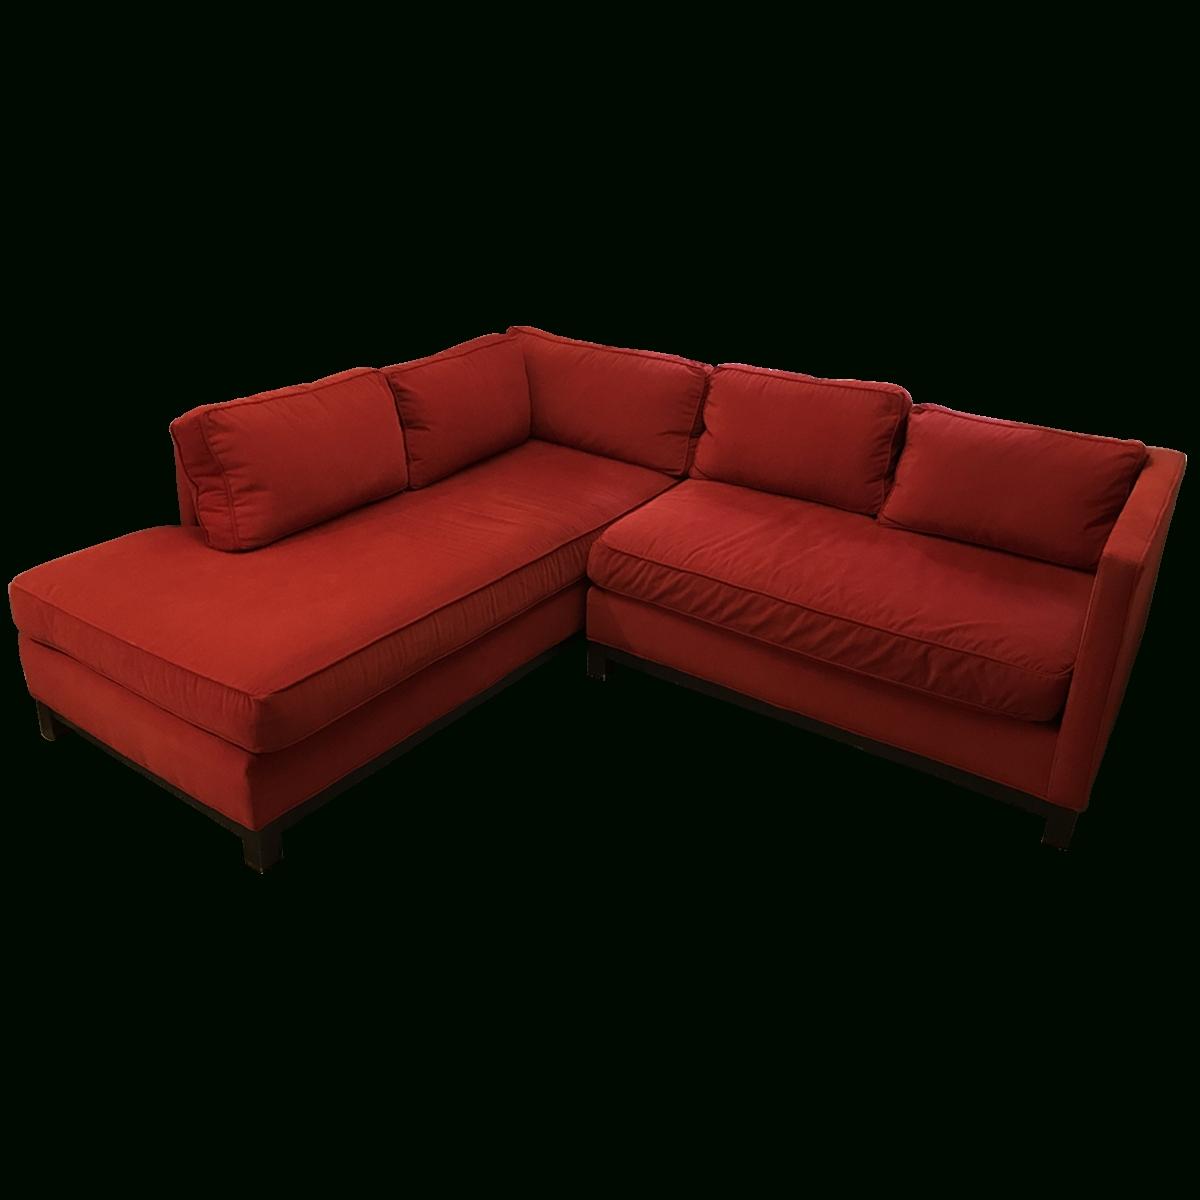 Viyet - Designer Furniture - Seating - Mitchell Gold + Bob in Gold Sectional Sofa (Image 24 of 25)